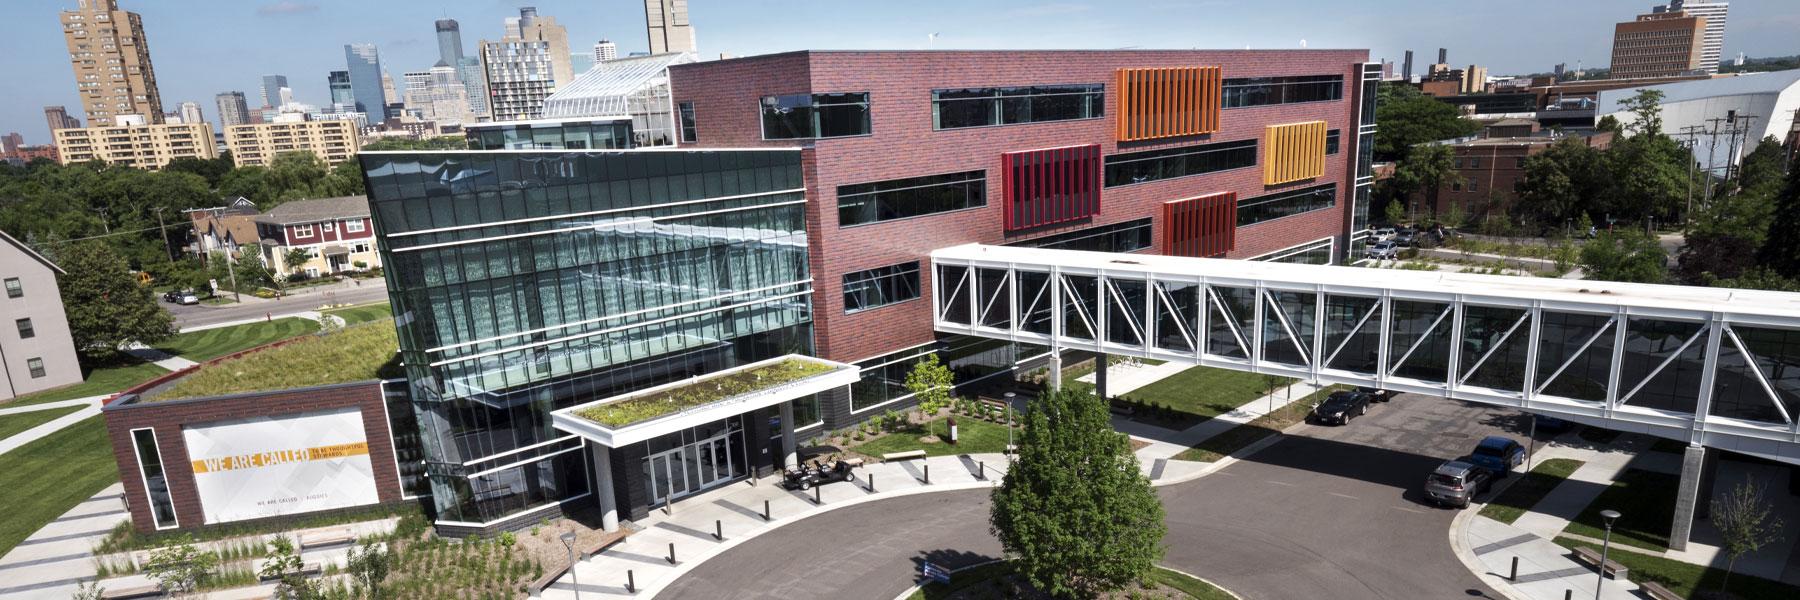 Augsburg University - Hagfors Center